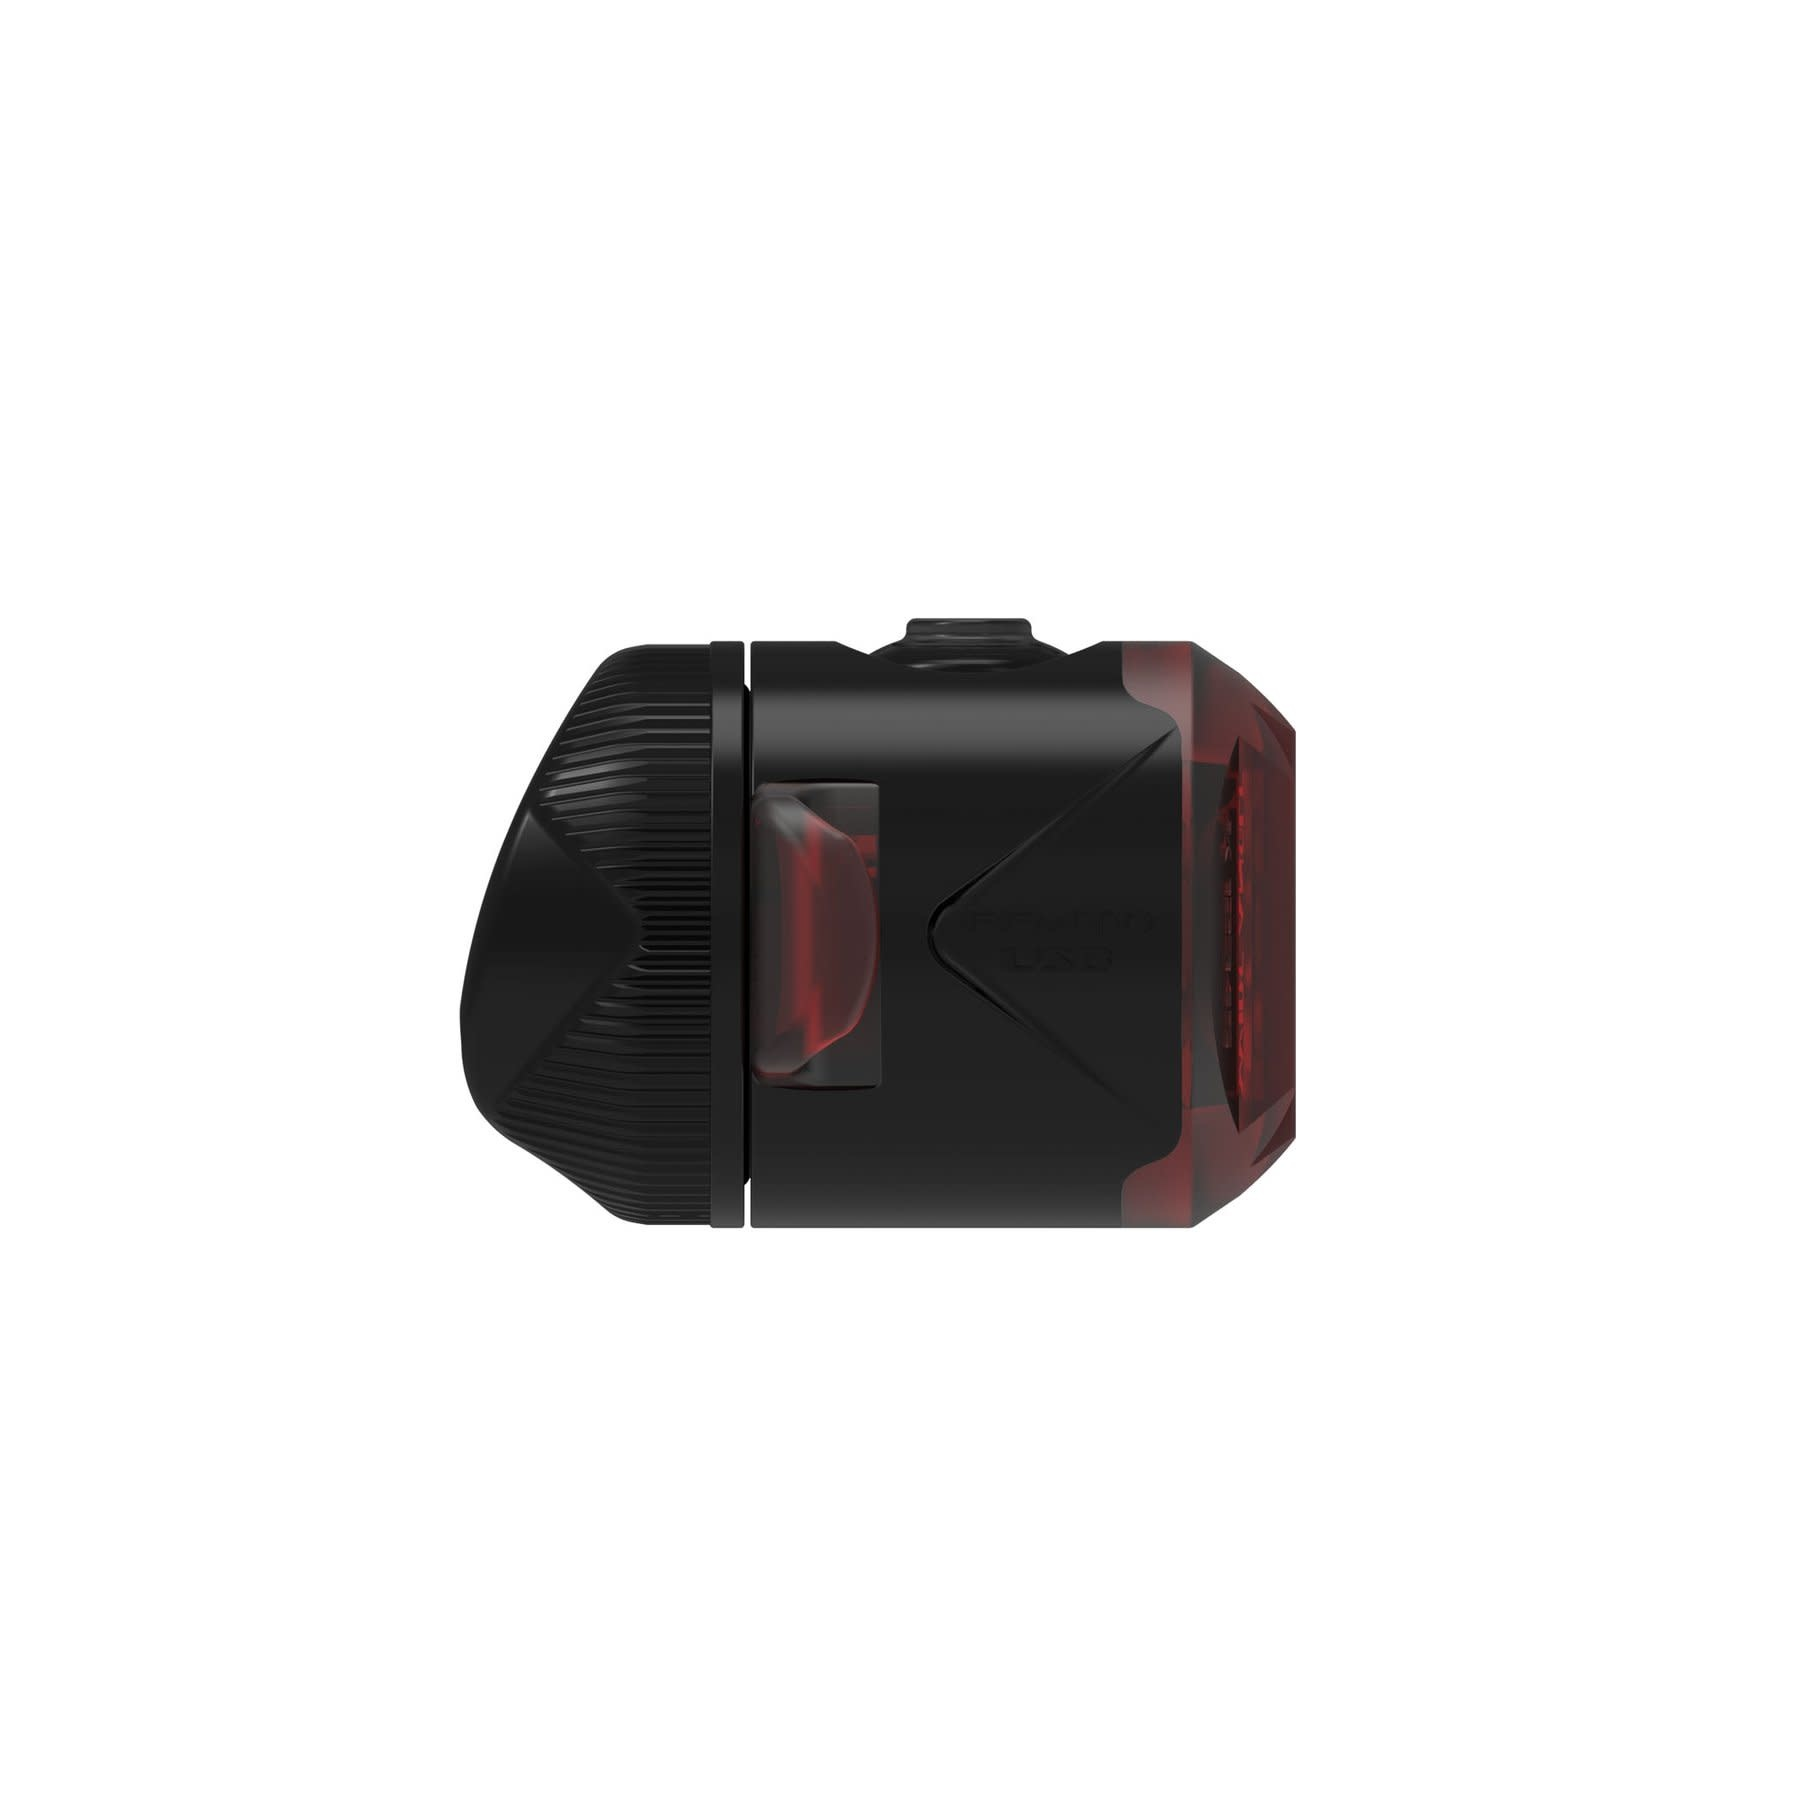 LEZYNE Lezyne Hecto Drive 500XL / Femto USB Bike Light Set